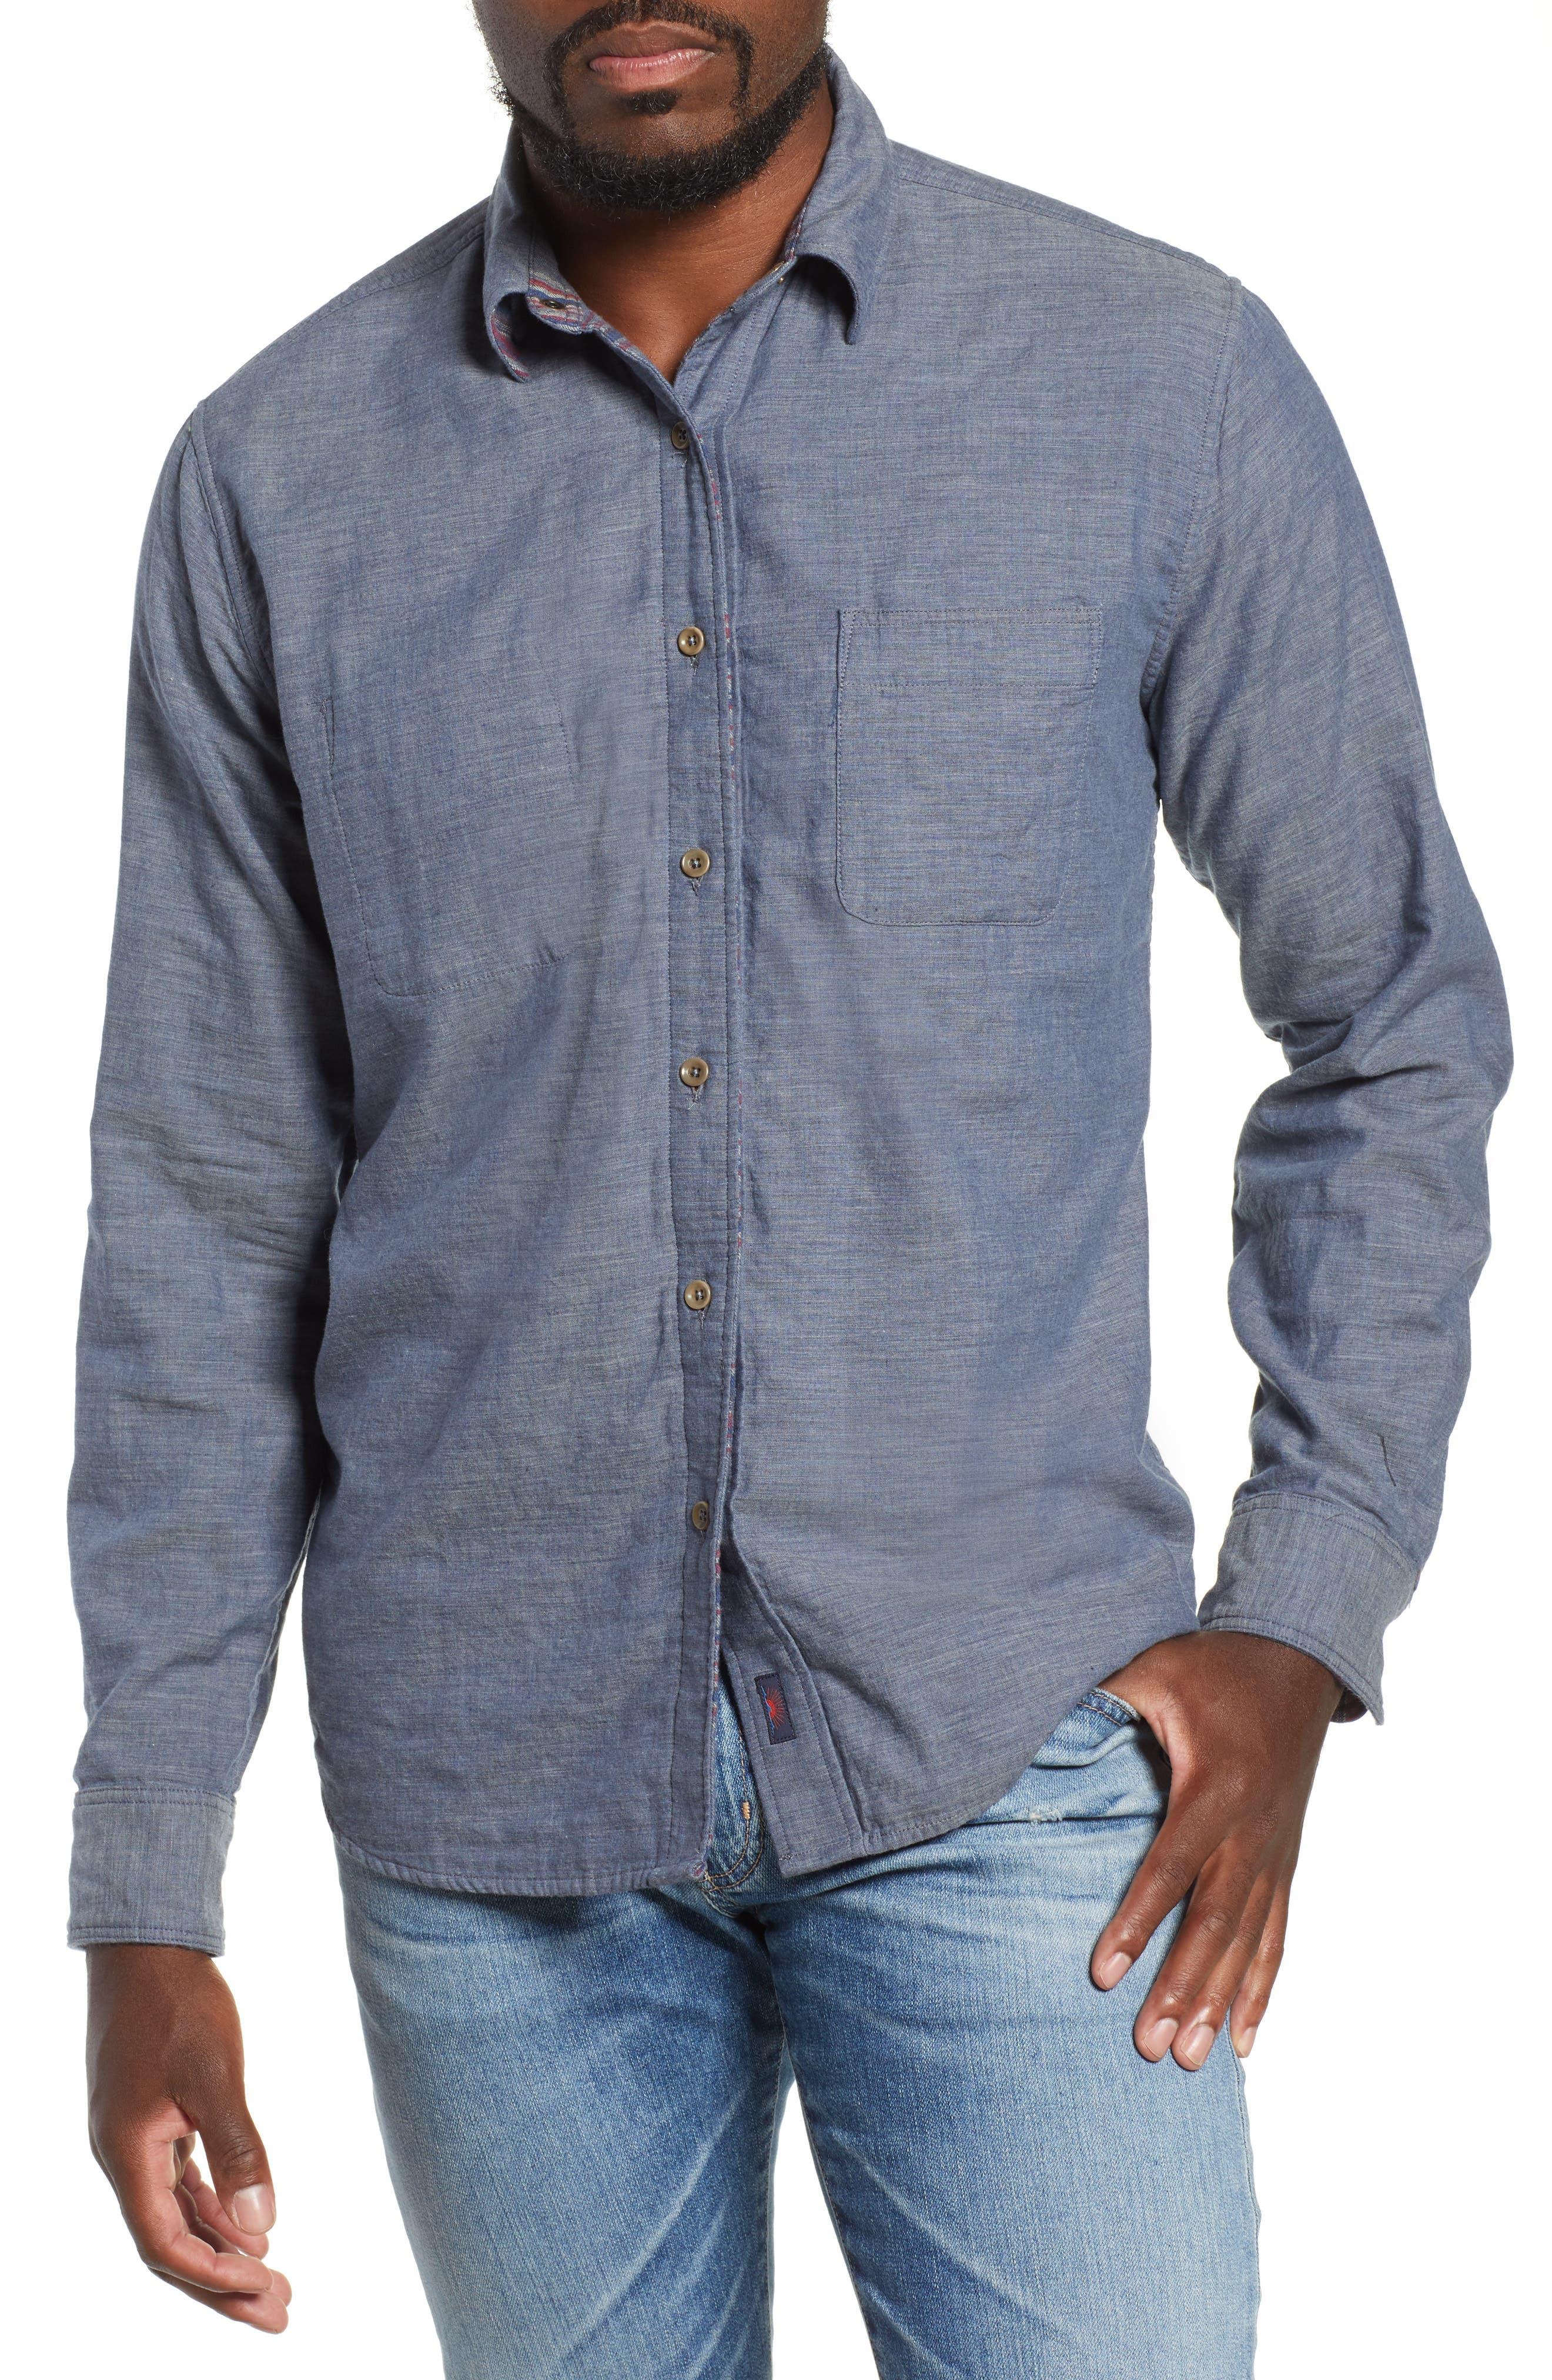 Belmar Reversible Sport Shirt,                         Main,                         color, SLATE HEATHER / SERAPE